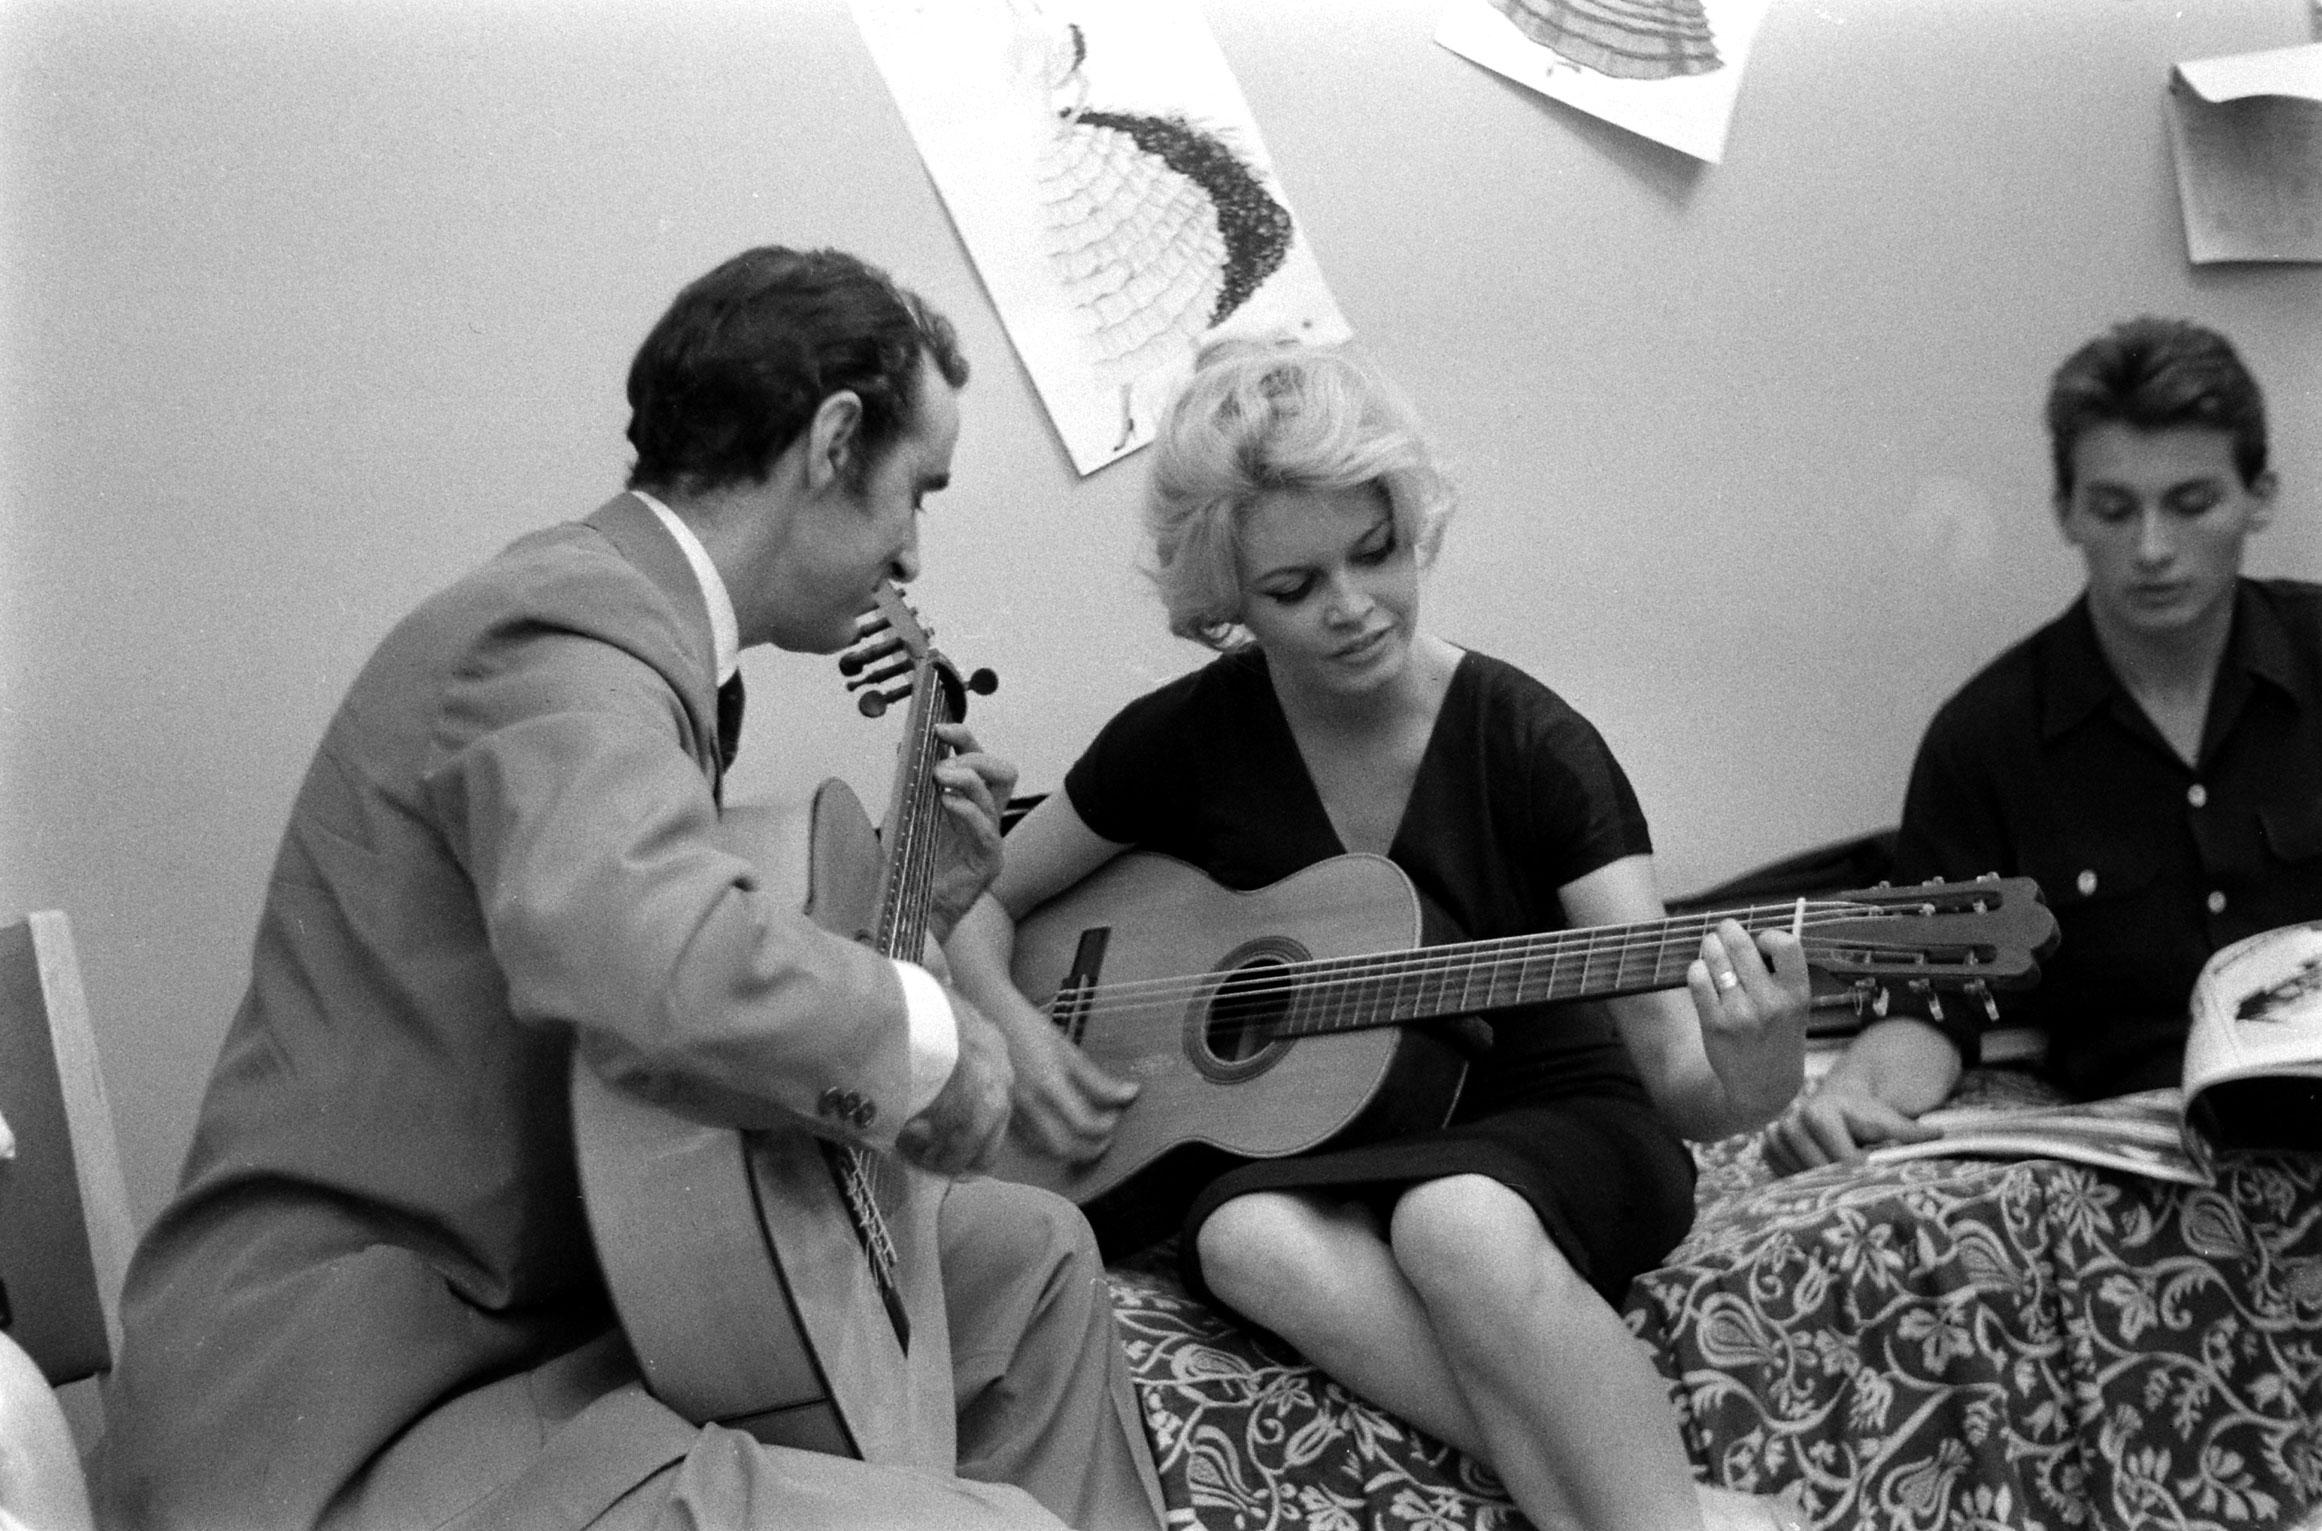 Brigitte Bardot plays the guitar while on the set of the film, <i>La Femme et le Pantin</i>, Spain, 1958.